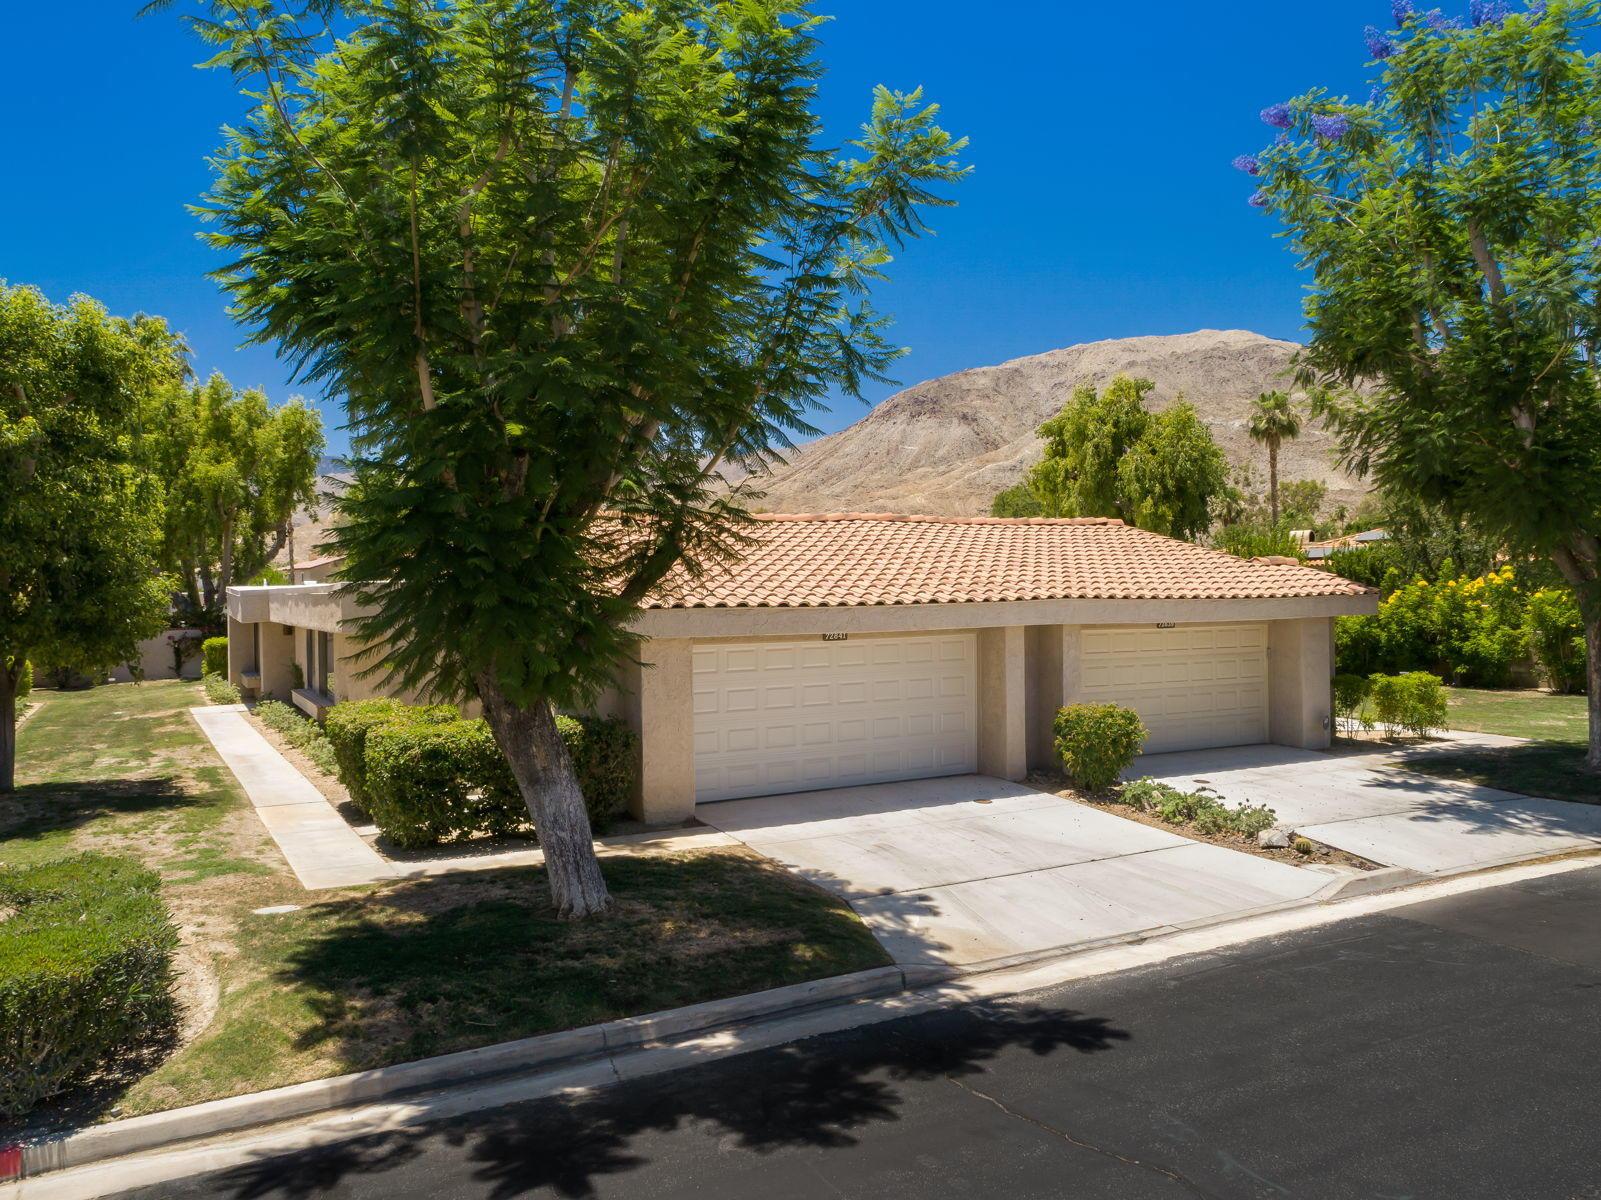 Photo of 72841 Fleetwood Circle, Palm Desert, CA 92260